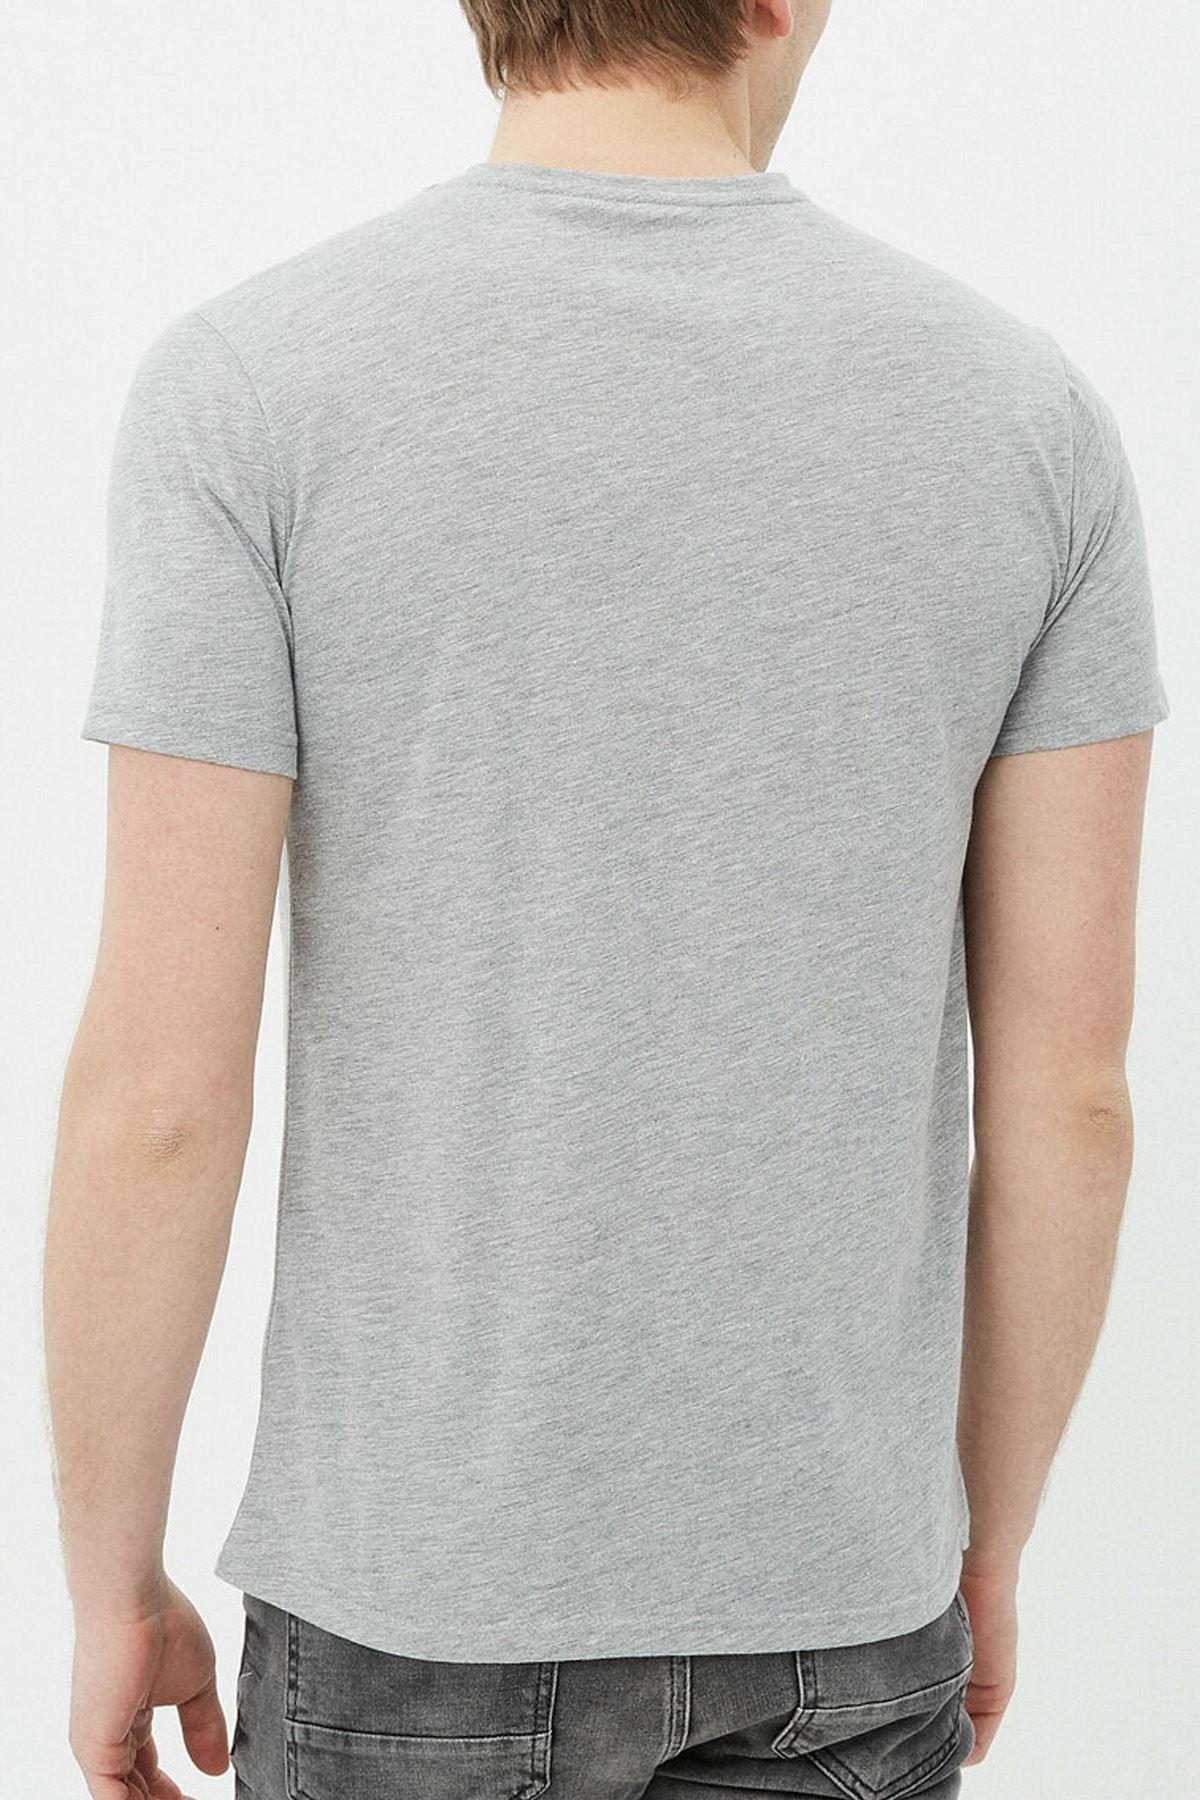 Anime Death Note 03 Gri Erkek Tshirt - Tişört